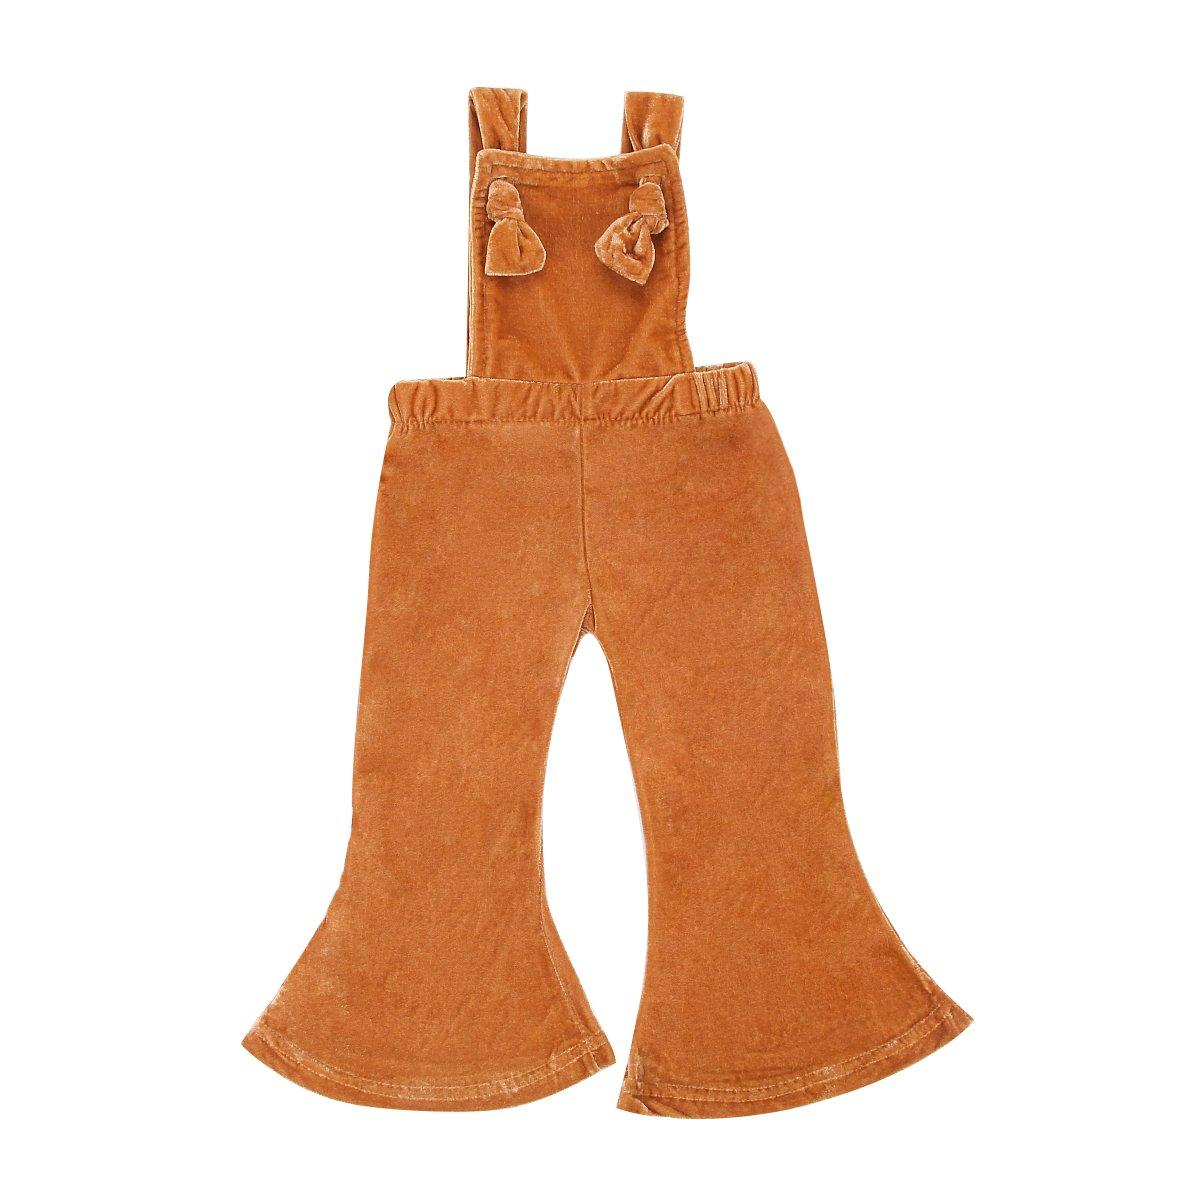 Hard-Working Crushed Velour Shorts Hot Pants Suspenders Purple Xs S M L Xl Xxl Xxxl Clothing, Shoes & Accessories